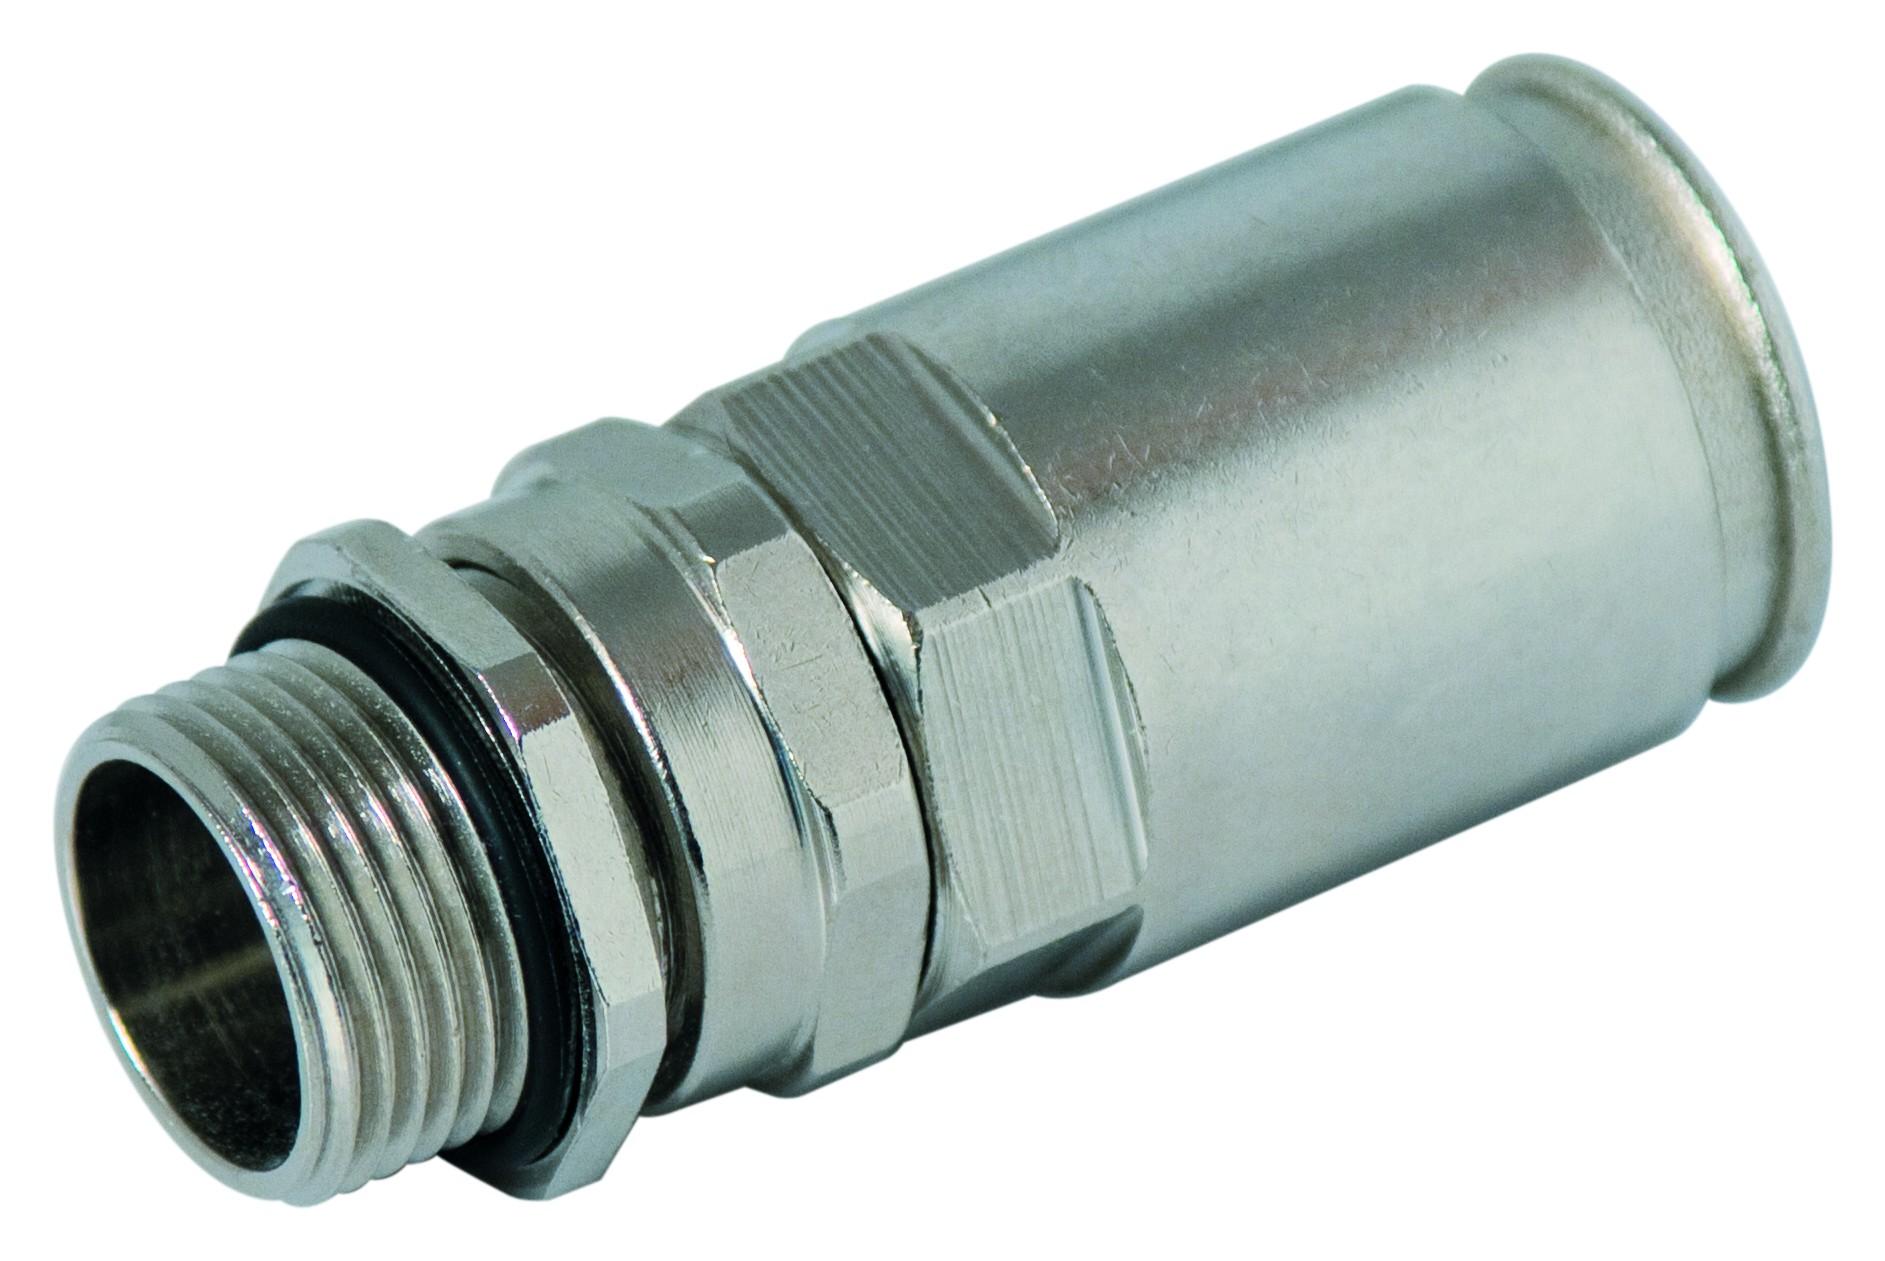 Raccordi pressacavo per tubi metallici rigidi for Raccordi per tubi scaldabagno